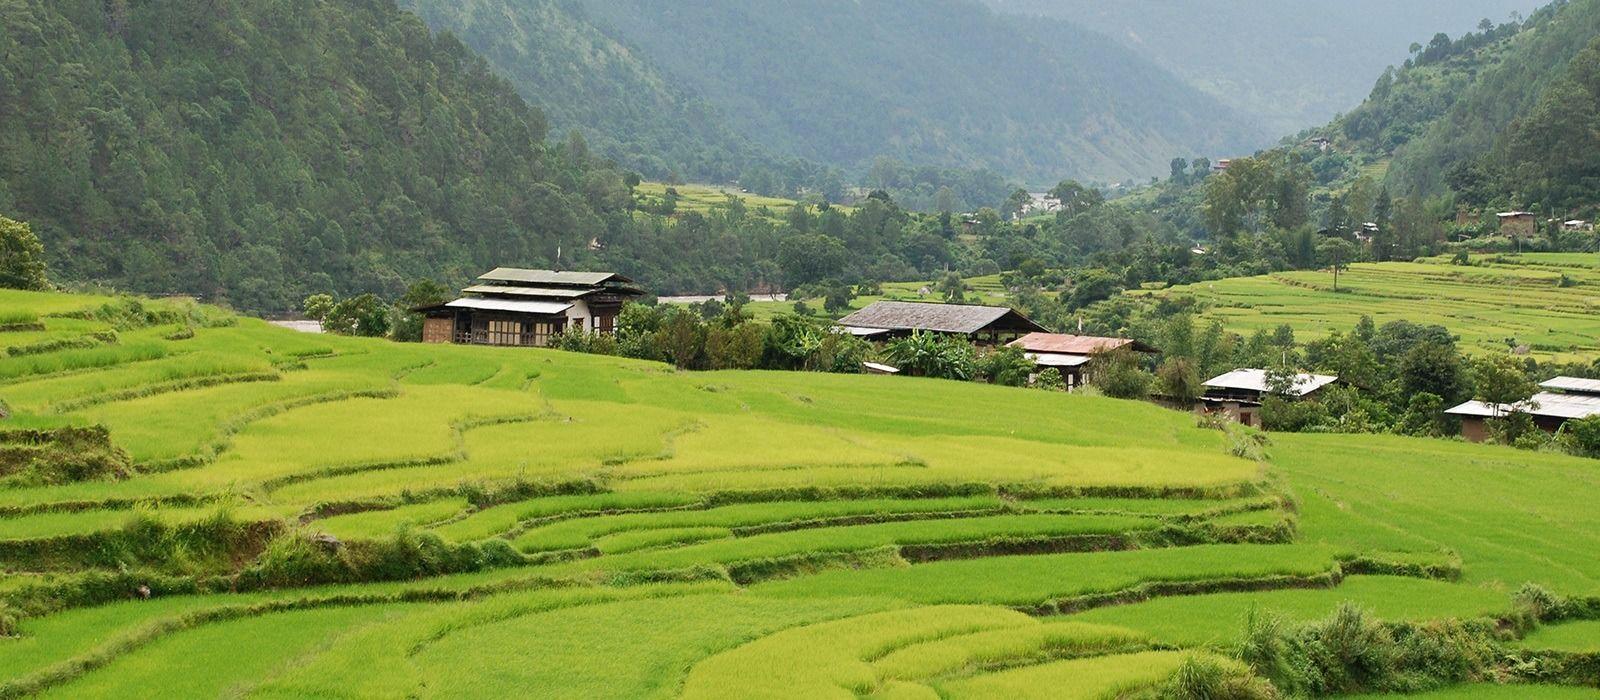 The Best of Bhutan Tour Trip 6